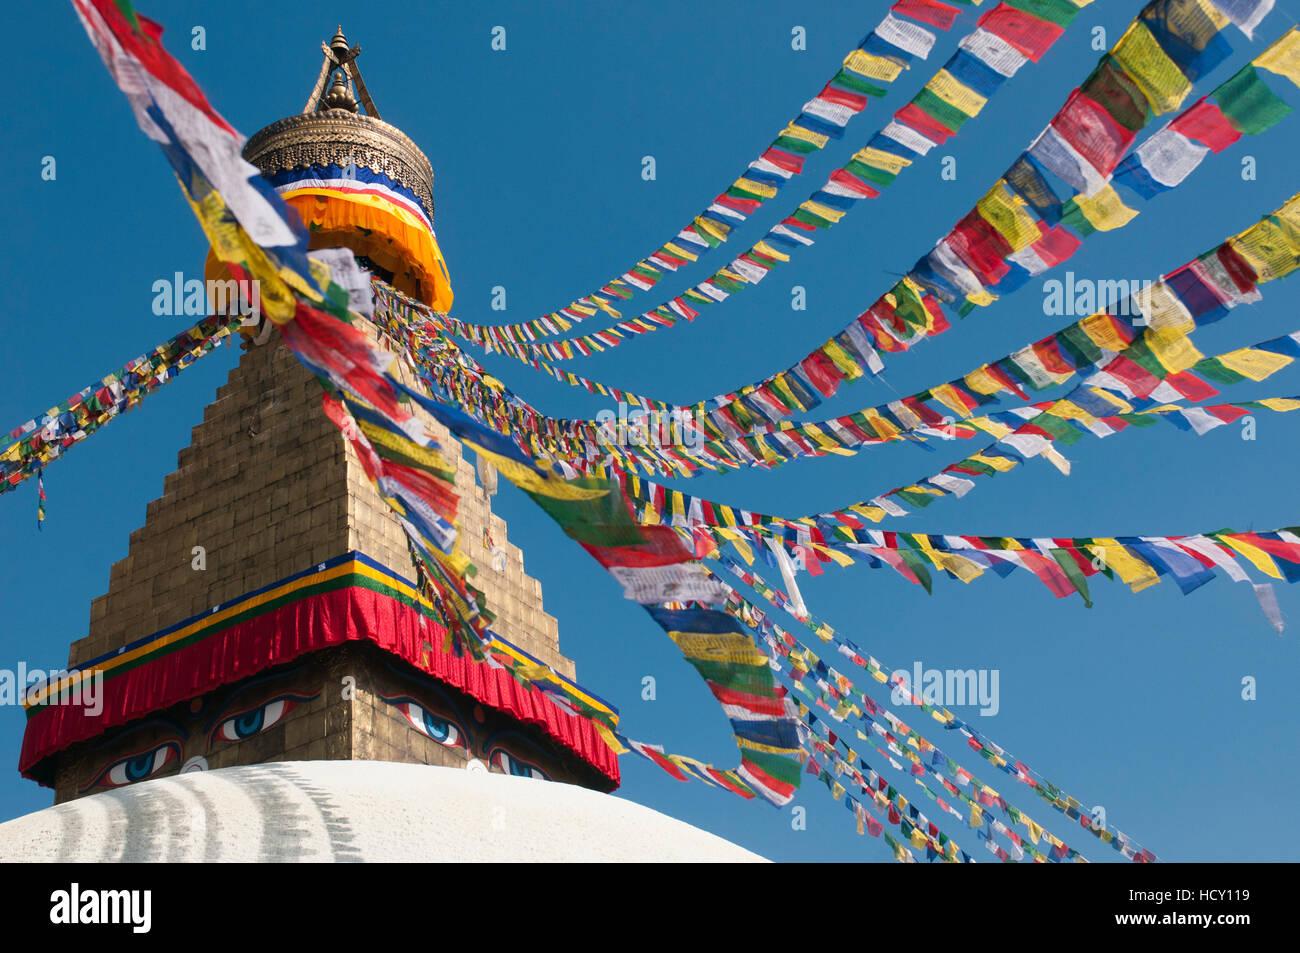 Bouddha (Boudhanath) (Bodnath) in Kathmandu is covered in colourful prayer flags, Kathmandu, Nepal - Stock Image